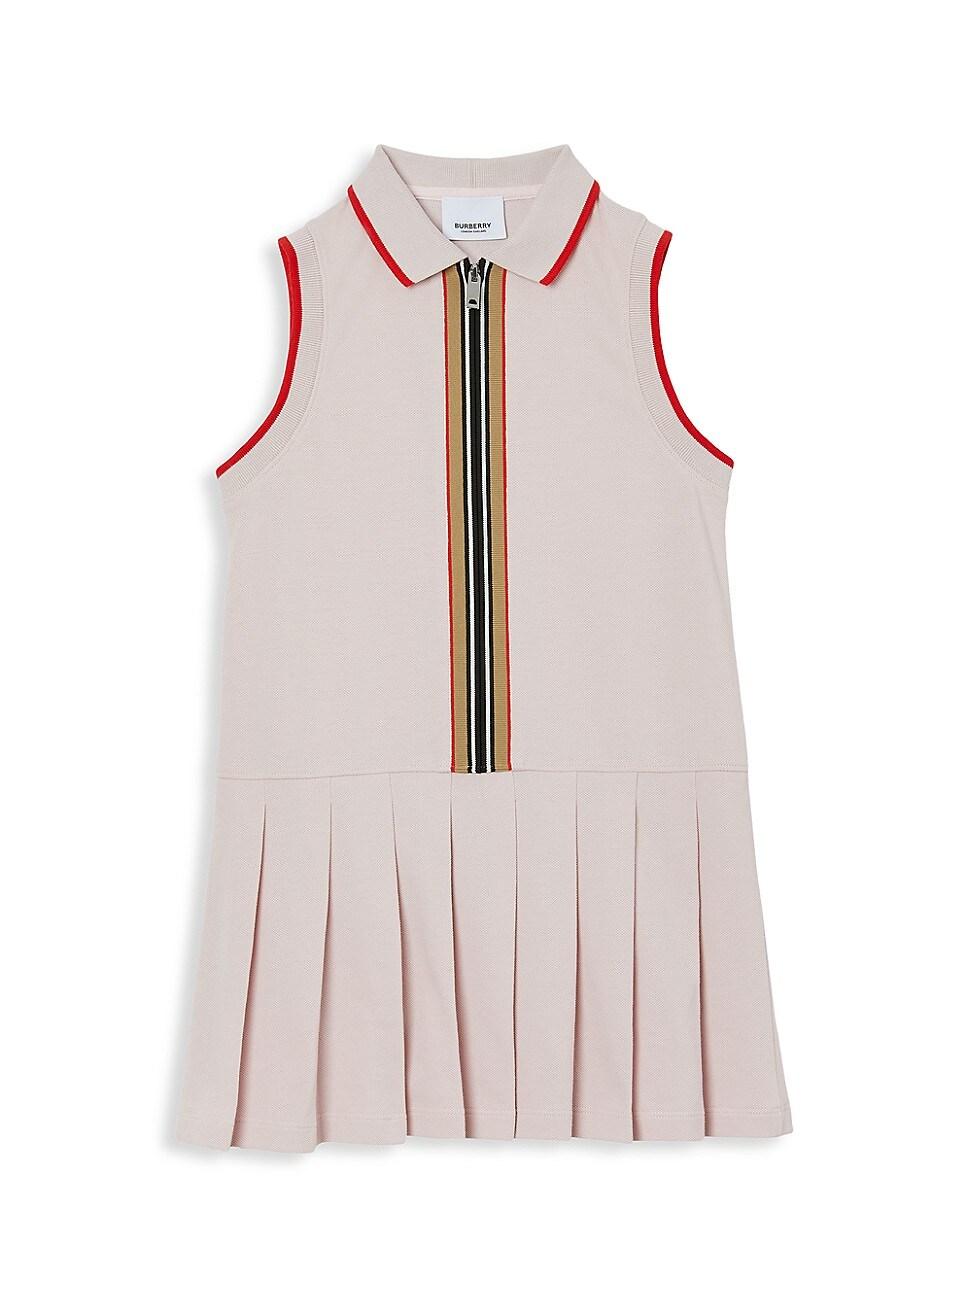 Burberry LITTLE GIRL'S & GIRL'S MARTINA POLO DRESS